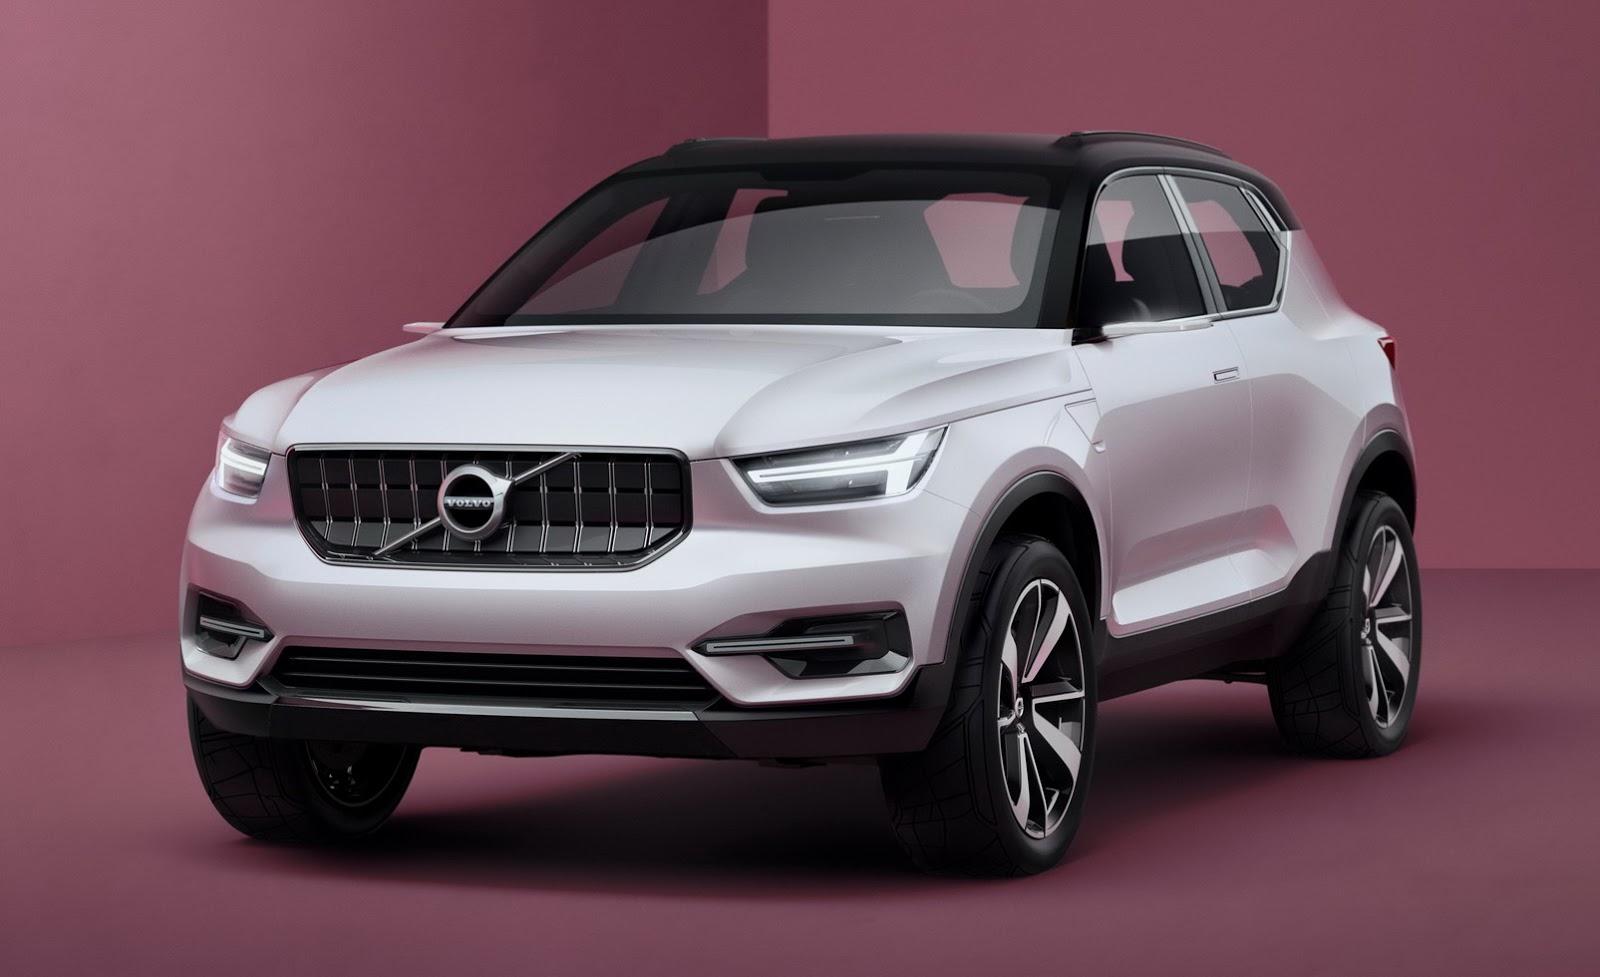 Gelecek Senelere Damga Vuracak SUV Modeller Volvo XC 40